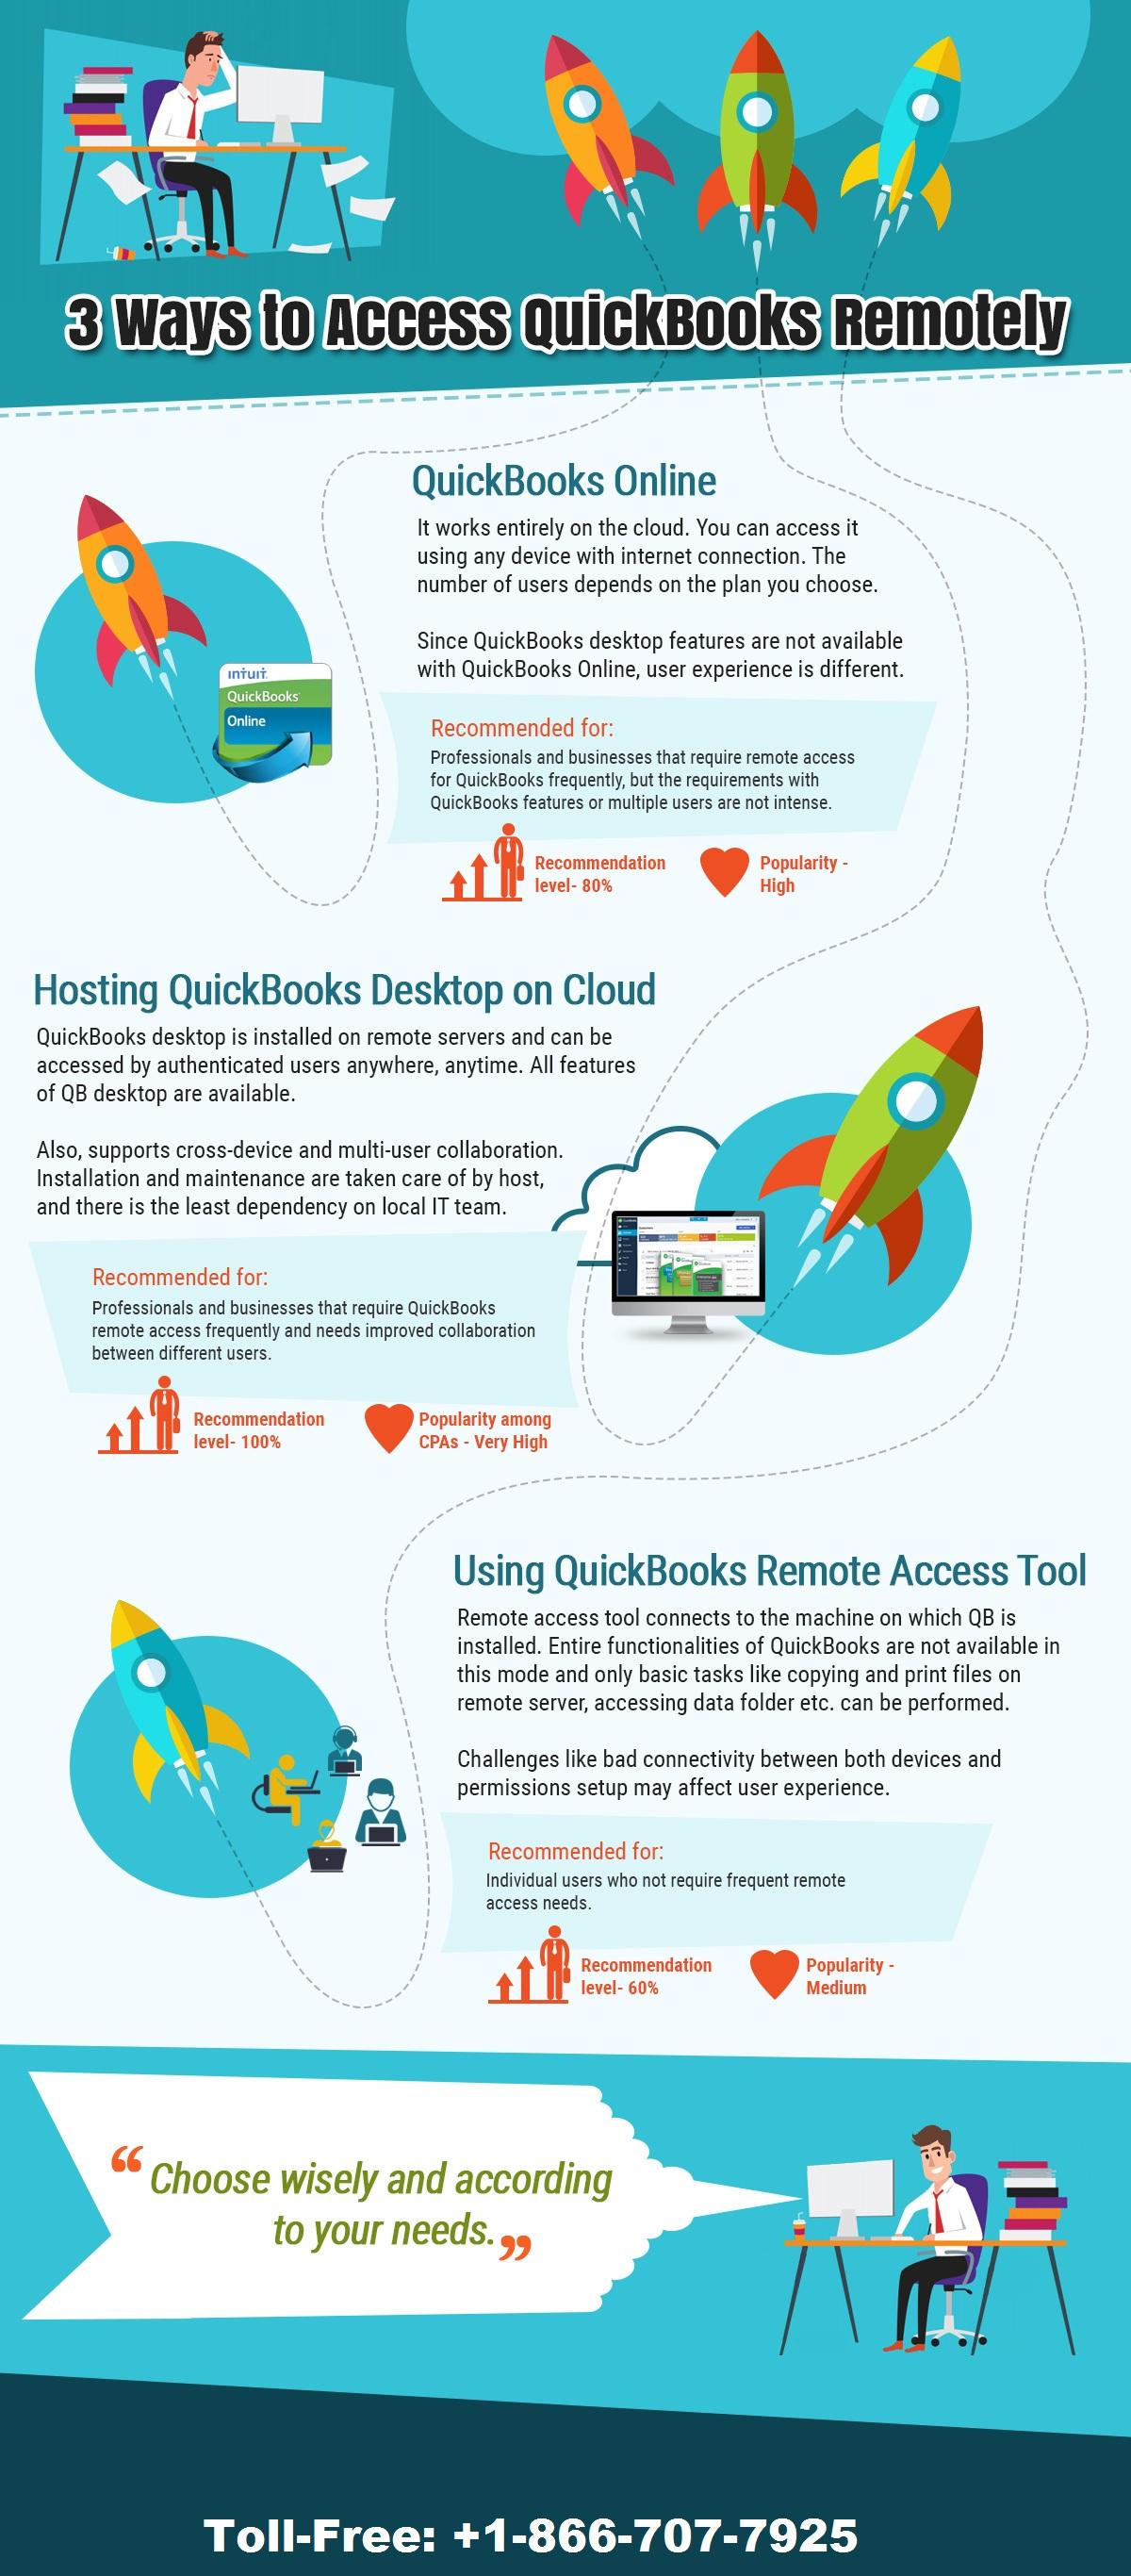 QuickBooks-Remote Access - Infographic